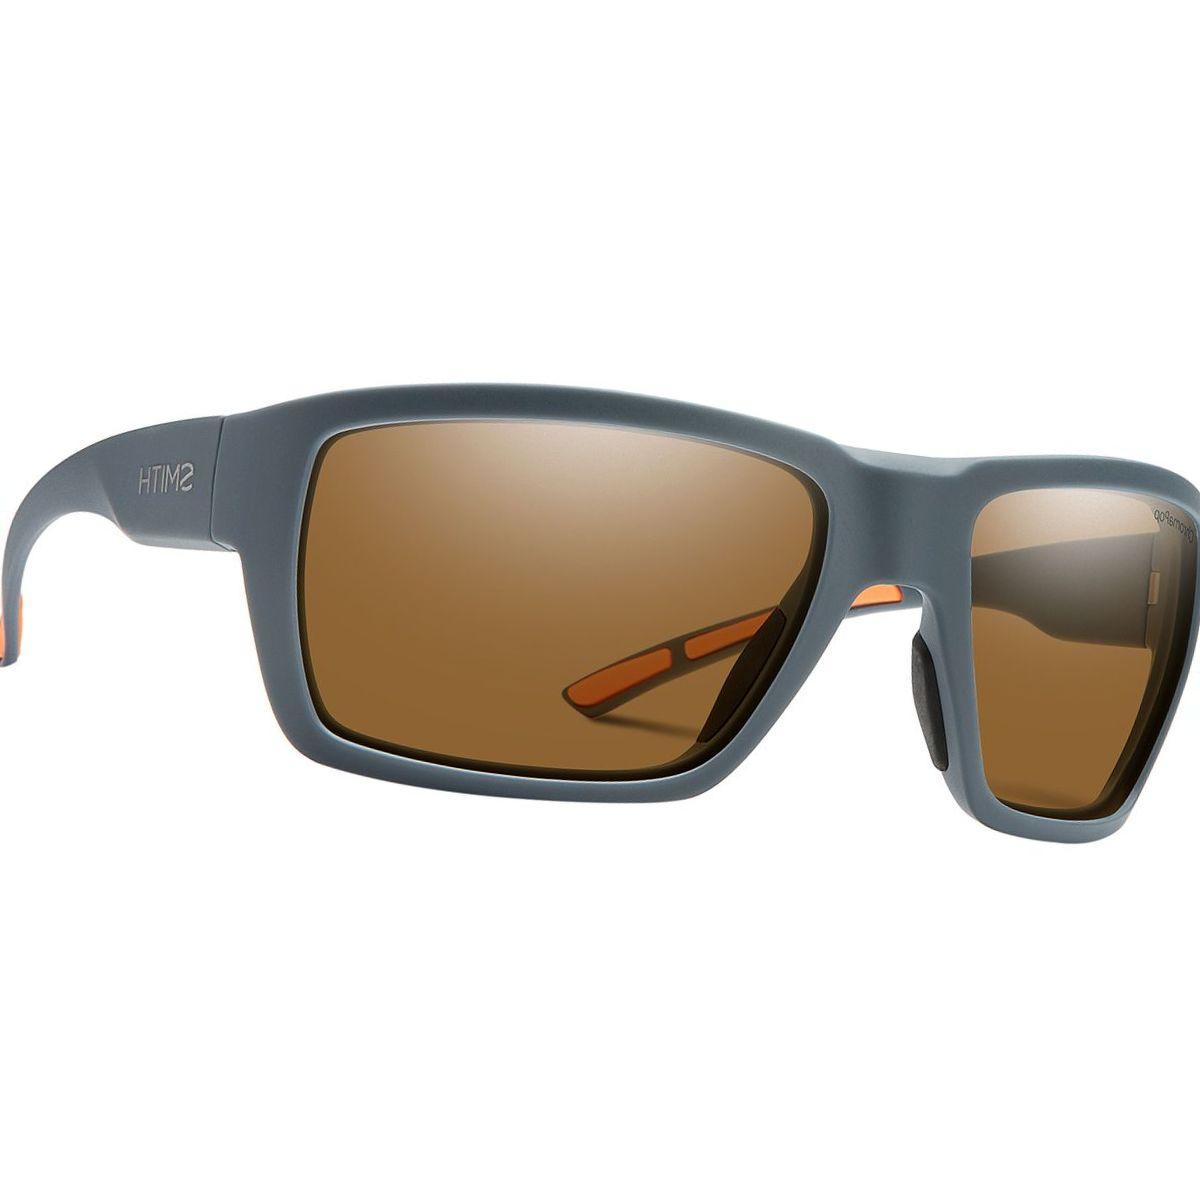 Smith Highwater ChromaPop+ Polarized Sunglasses - Men's